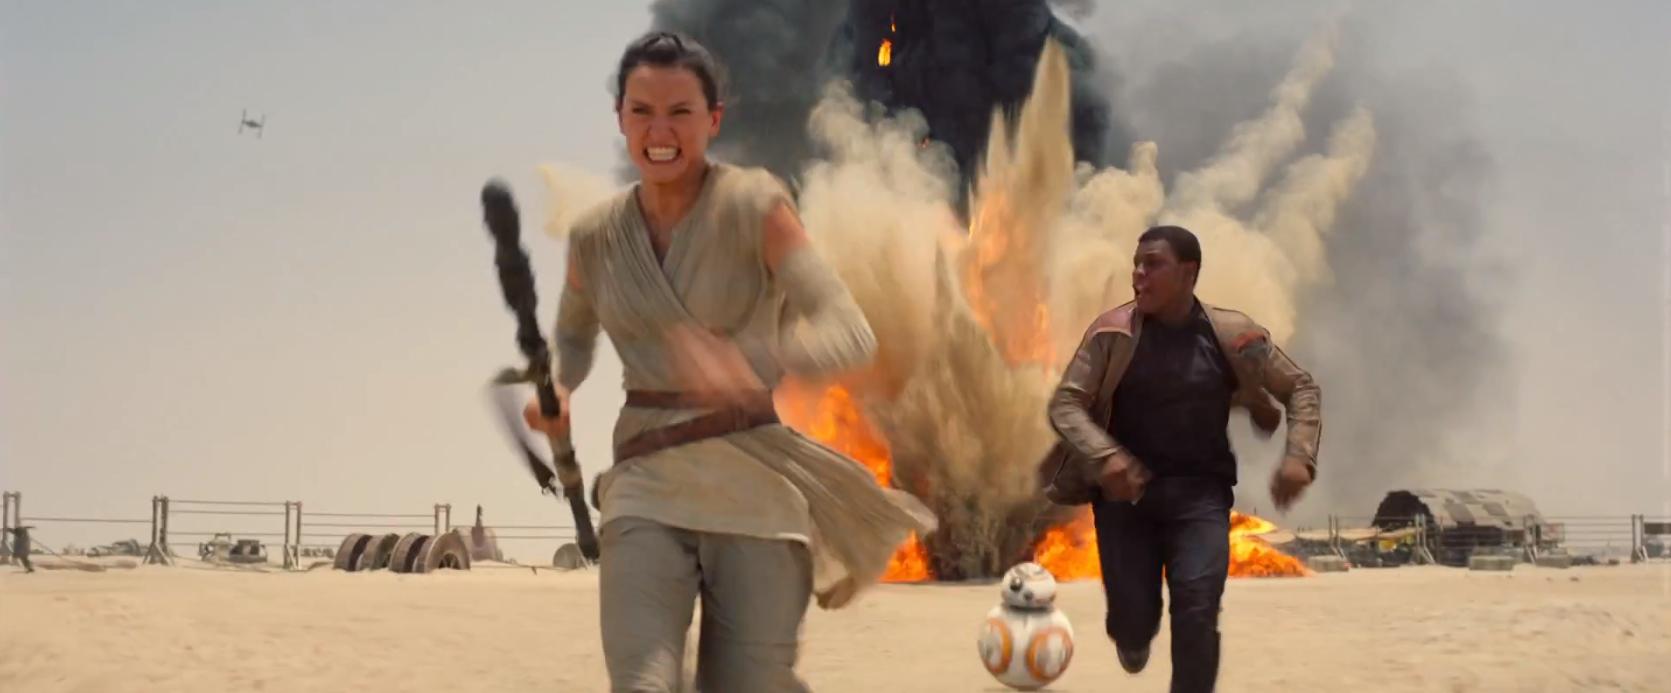 Star Wars The Force Awakens Rey Finn BB-8